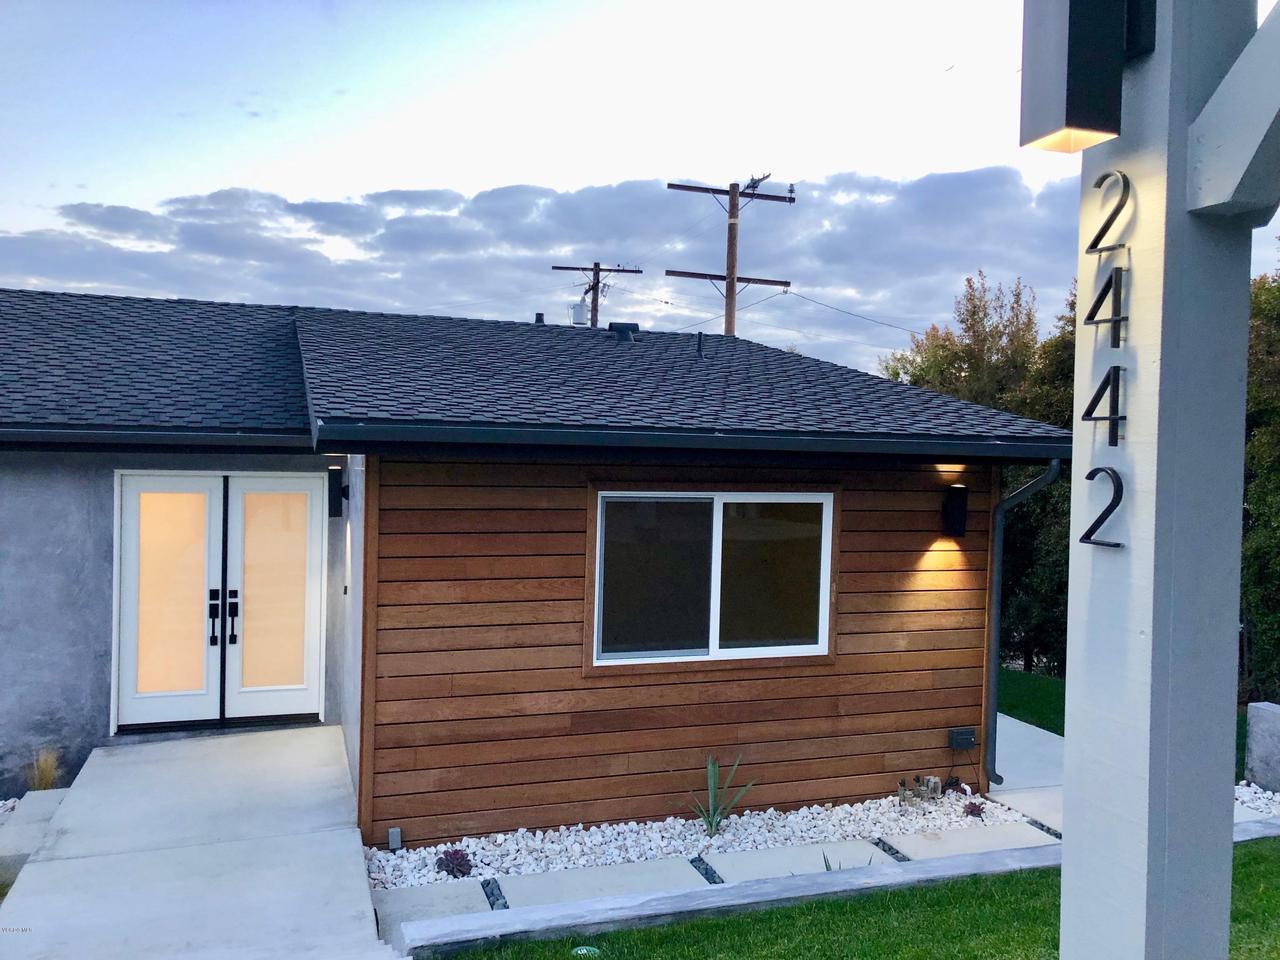 2442 SHERWOOD, Ventura, CA 93001 - 1